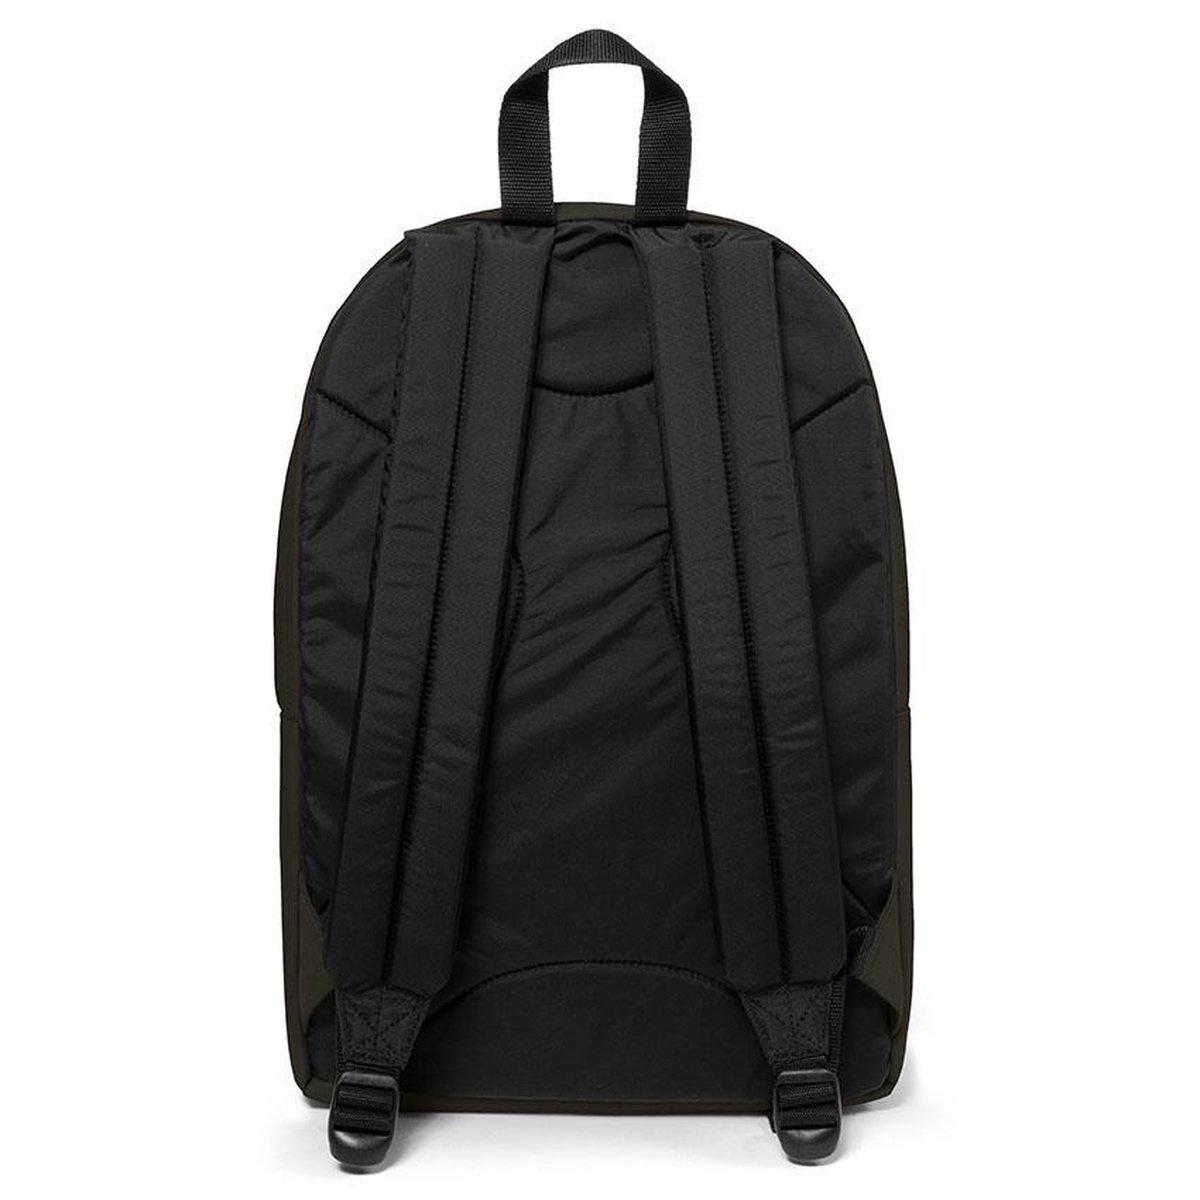 Eastpak Eastpak Back To Work schooltas met laptopvak  - Bush Khaki